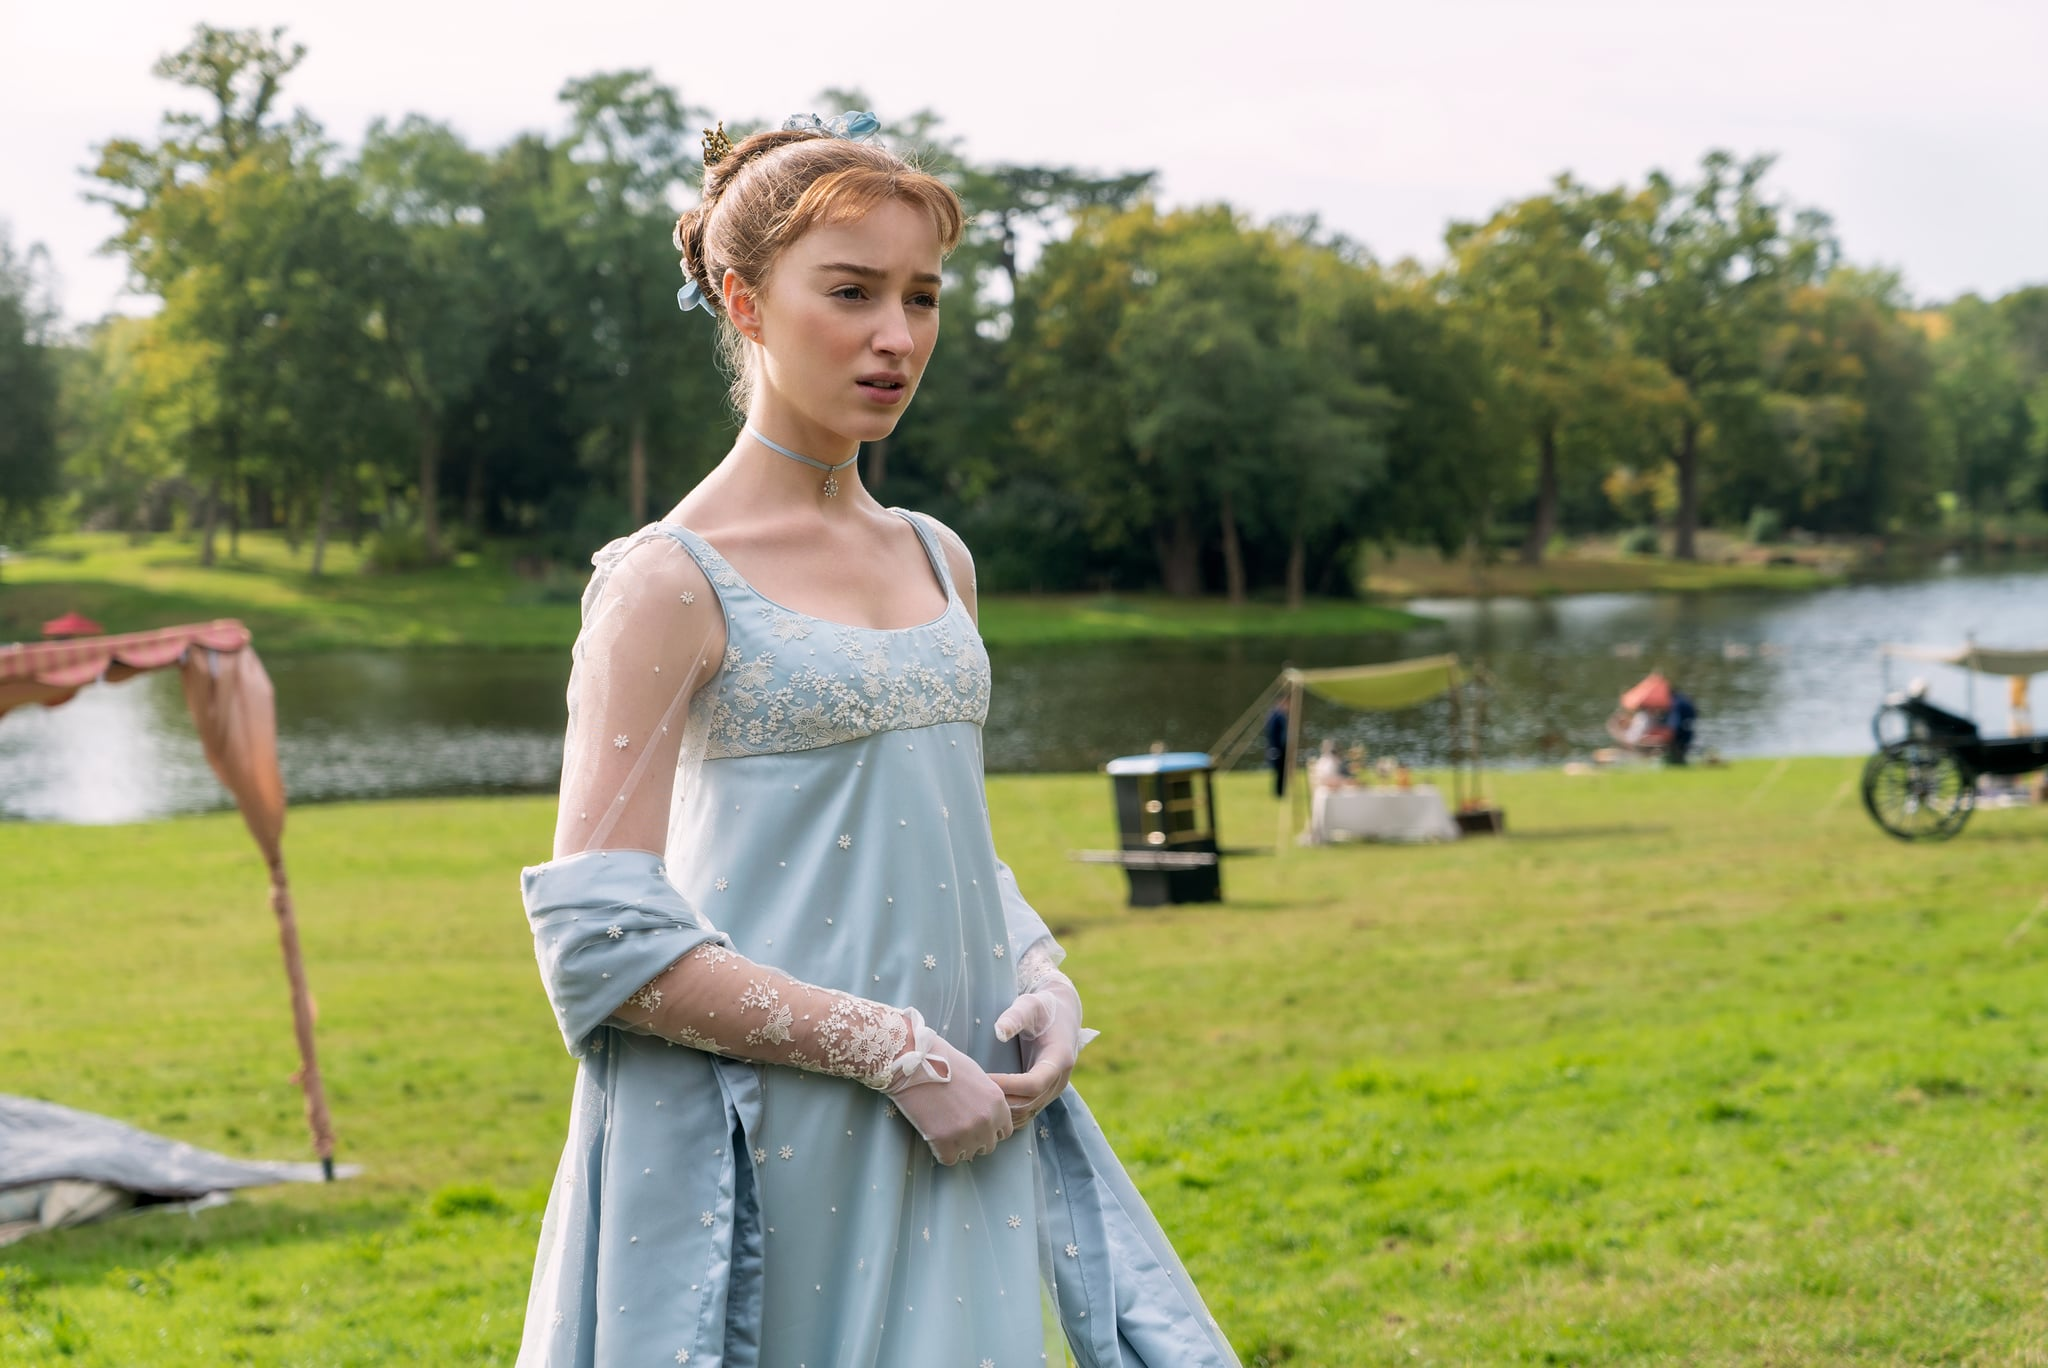 BRIDGERTON PHOEBE DYNEVOR as DAPHNE BRIDGERTON in episode 102 of BRIDGERTON Cr. LIAM DANIEL/NETFLIX  2020